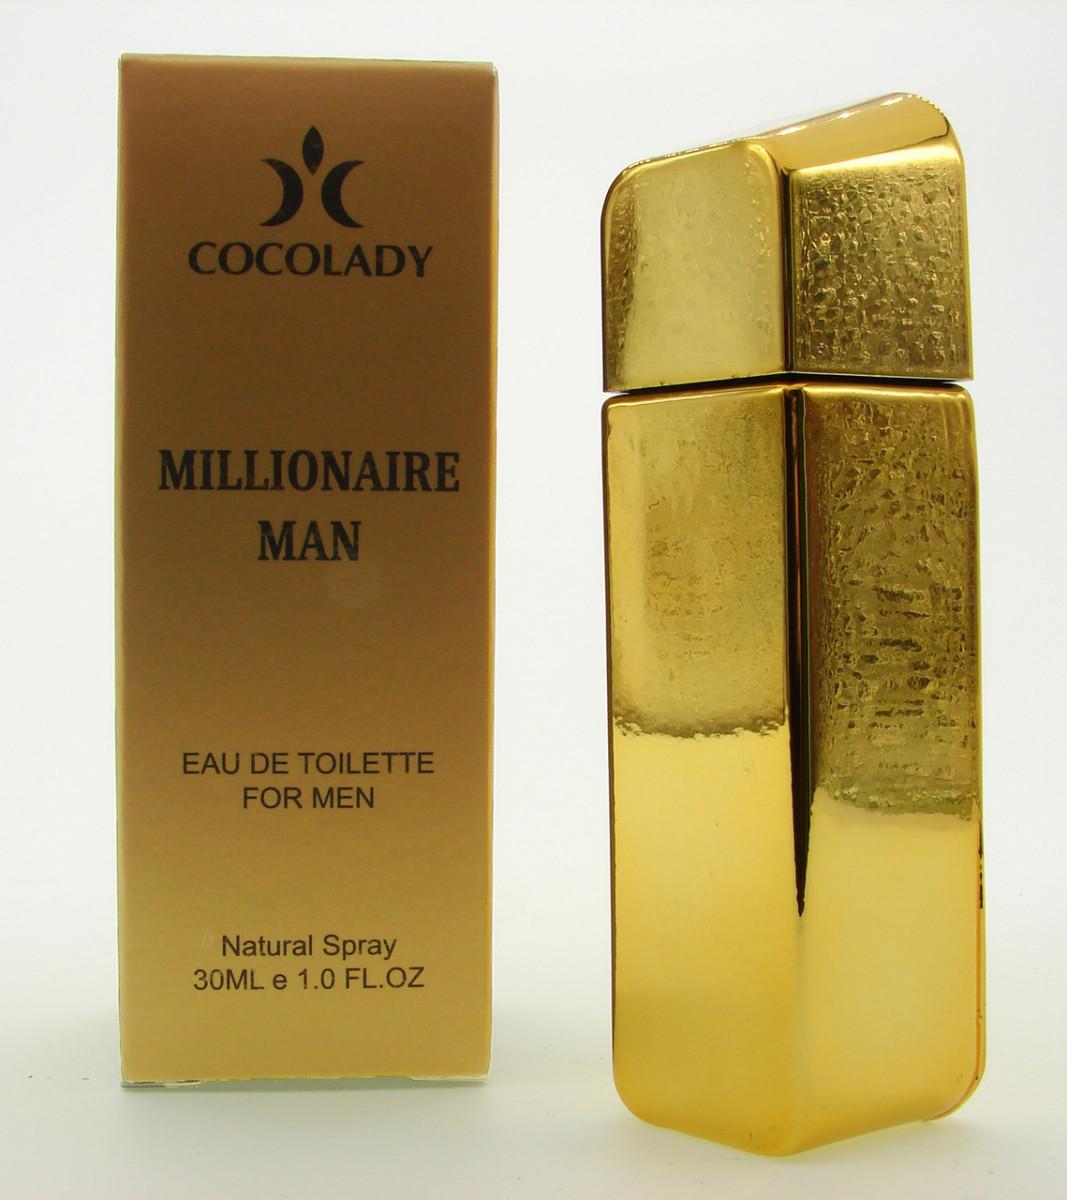 Cocolady Millionaire Man edp 30 ml TOPfor